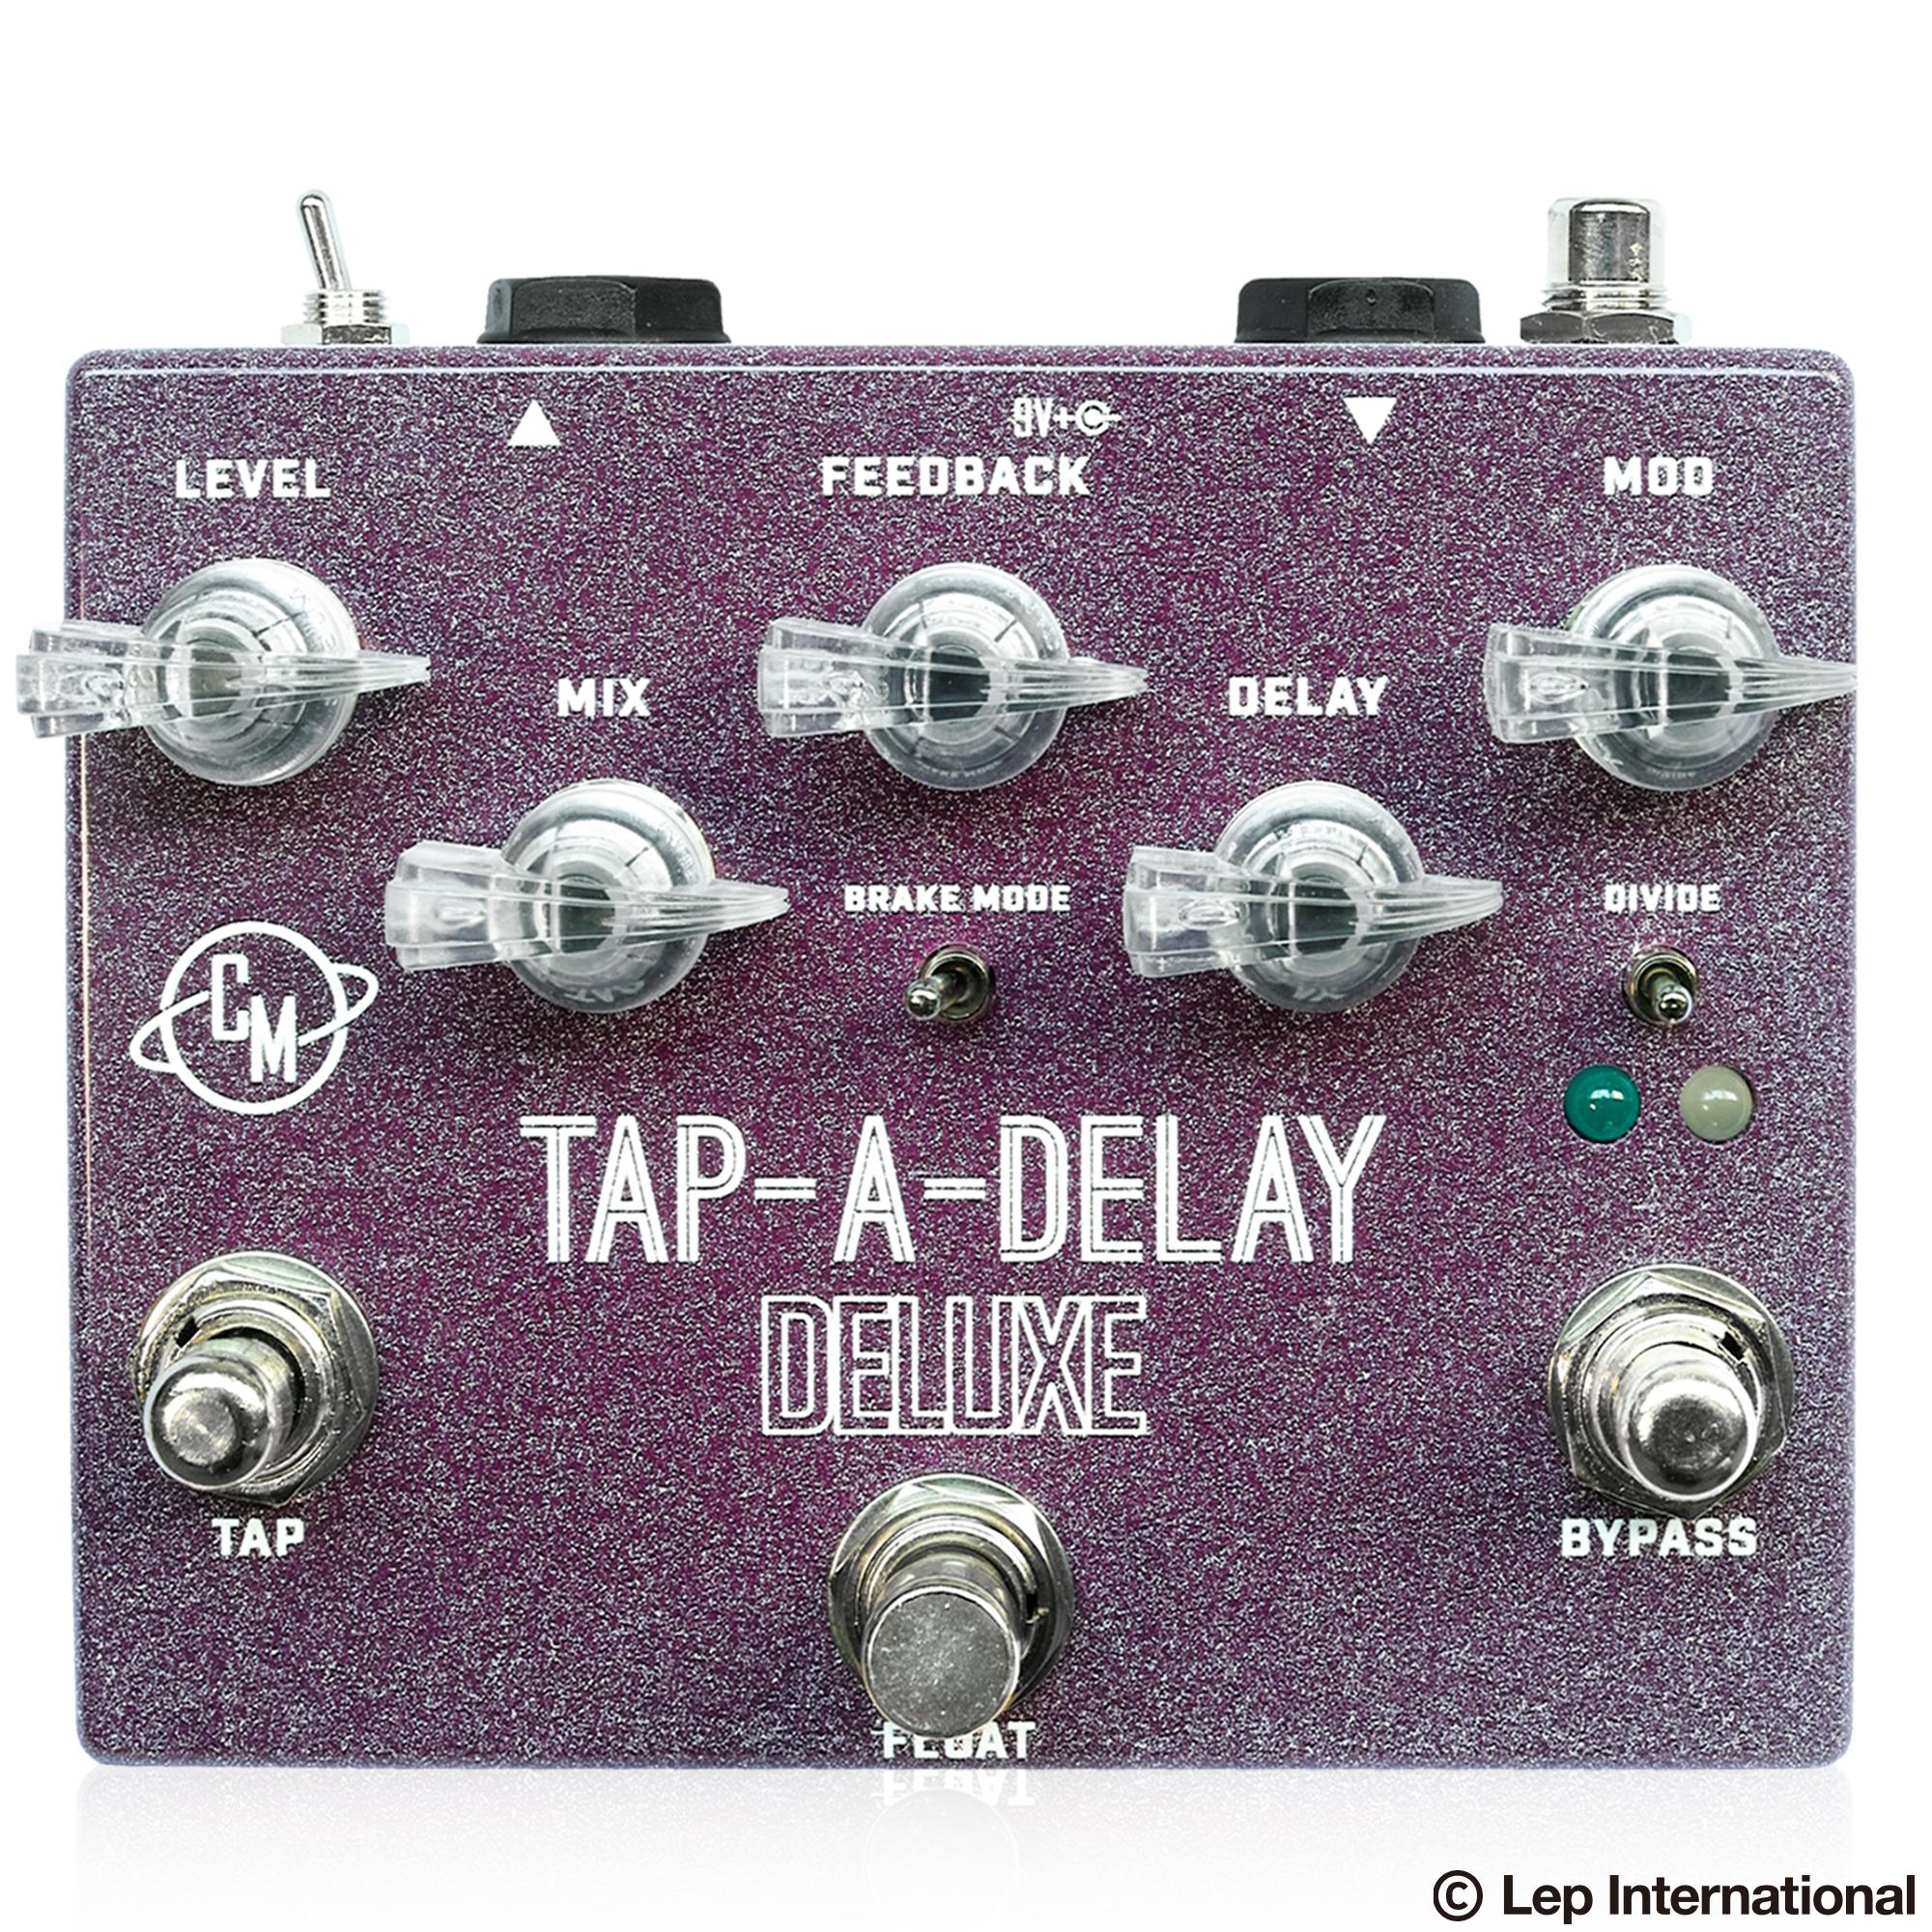 Tap-A-Deray-Deluxe-01.jpg